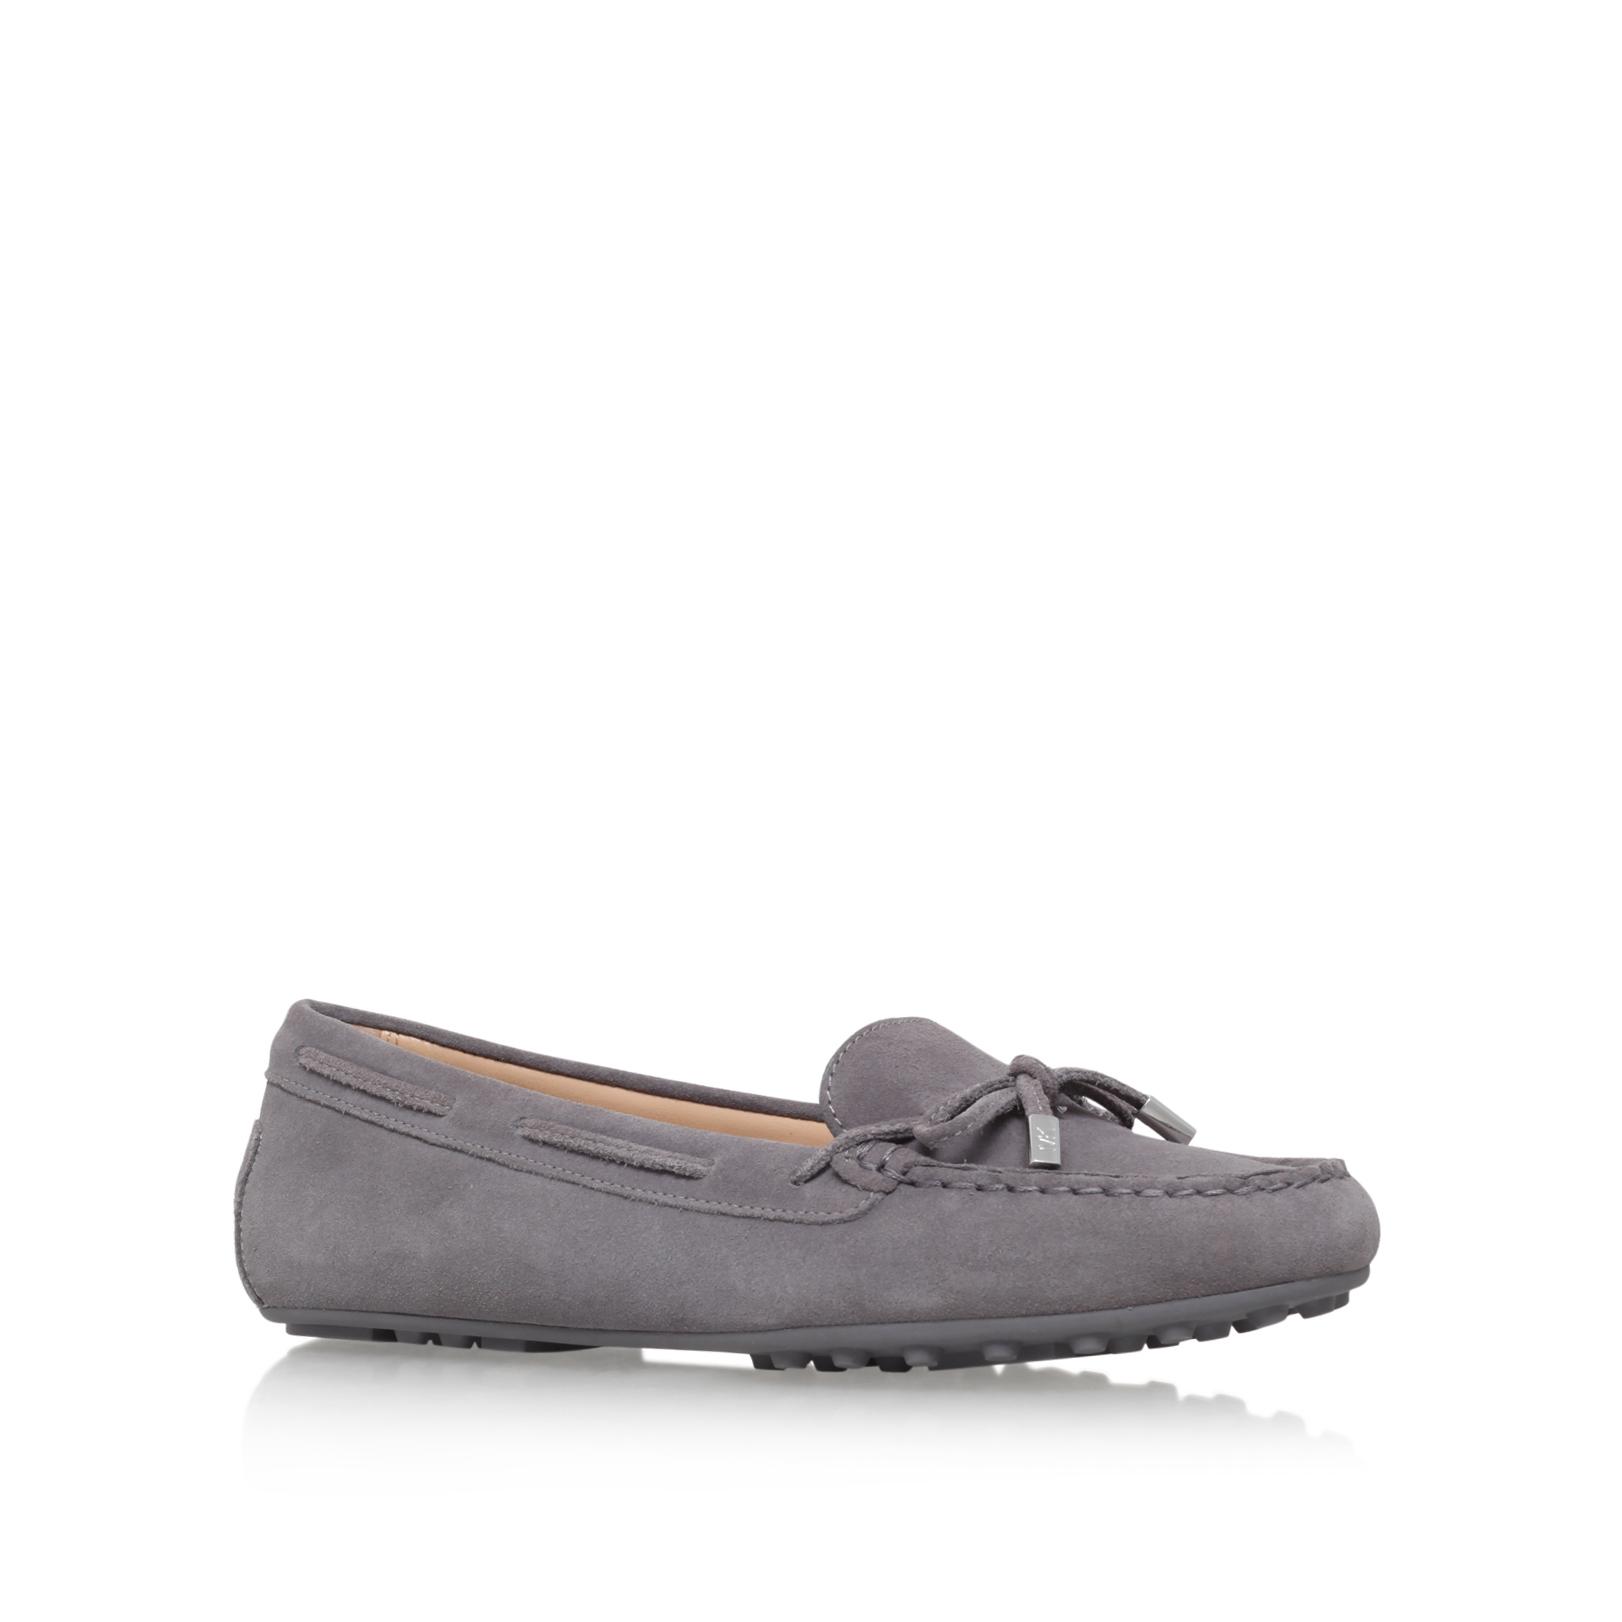 59cbfbd1b70d1 DAISY MOC Michael Michael Kors Daisy Light Grey Suede Flat Loafers ...